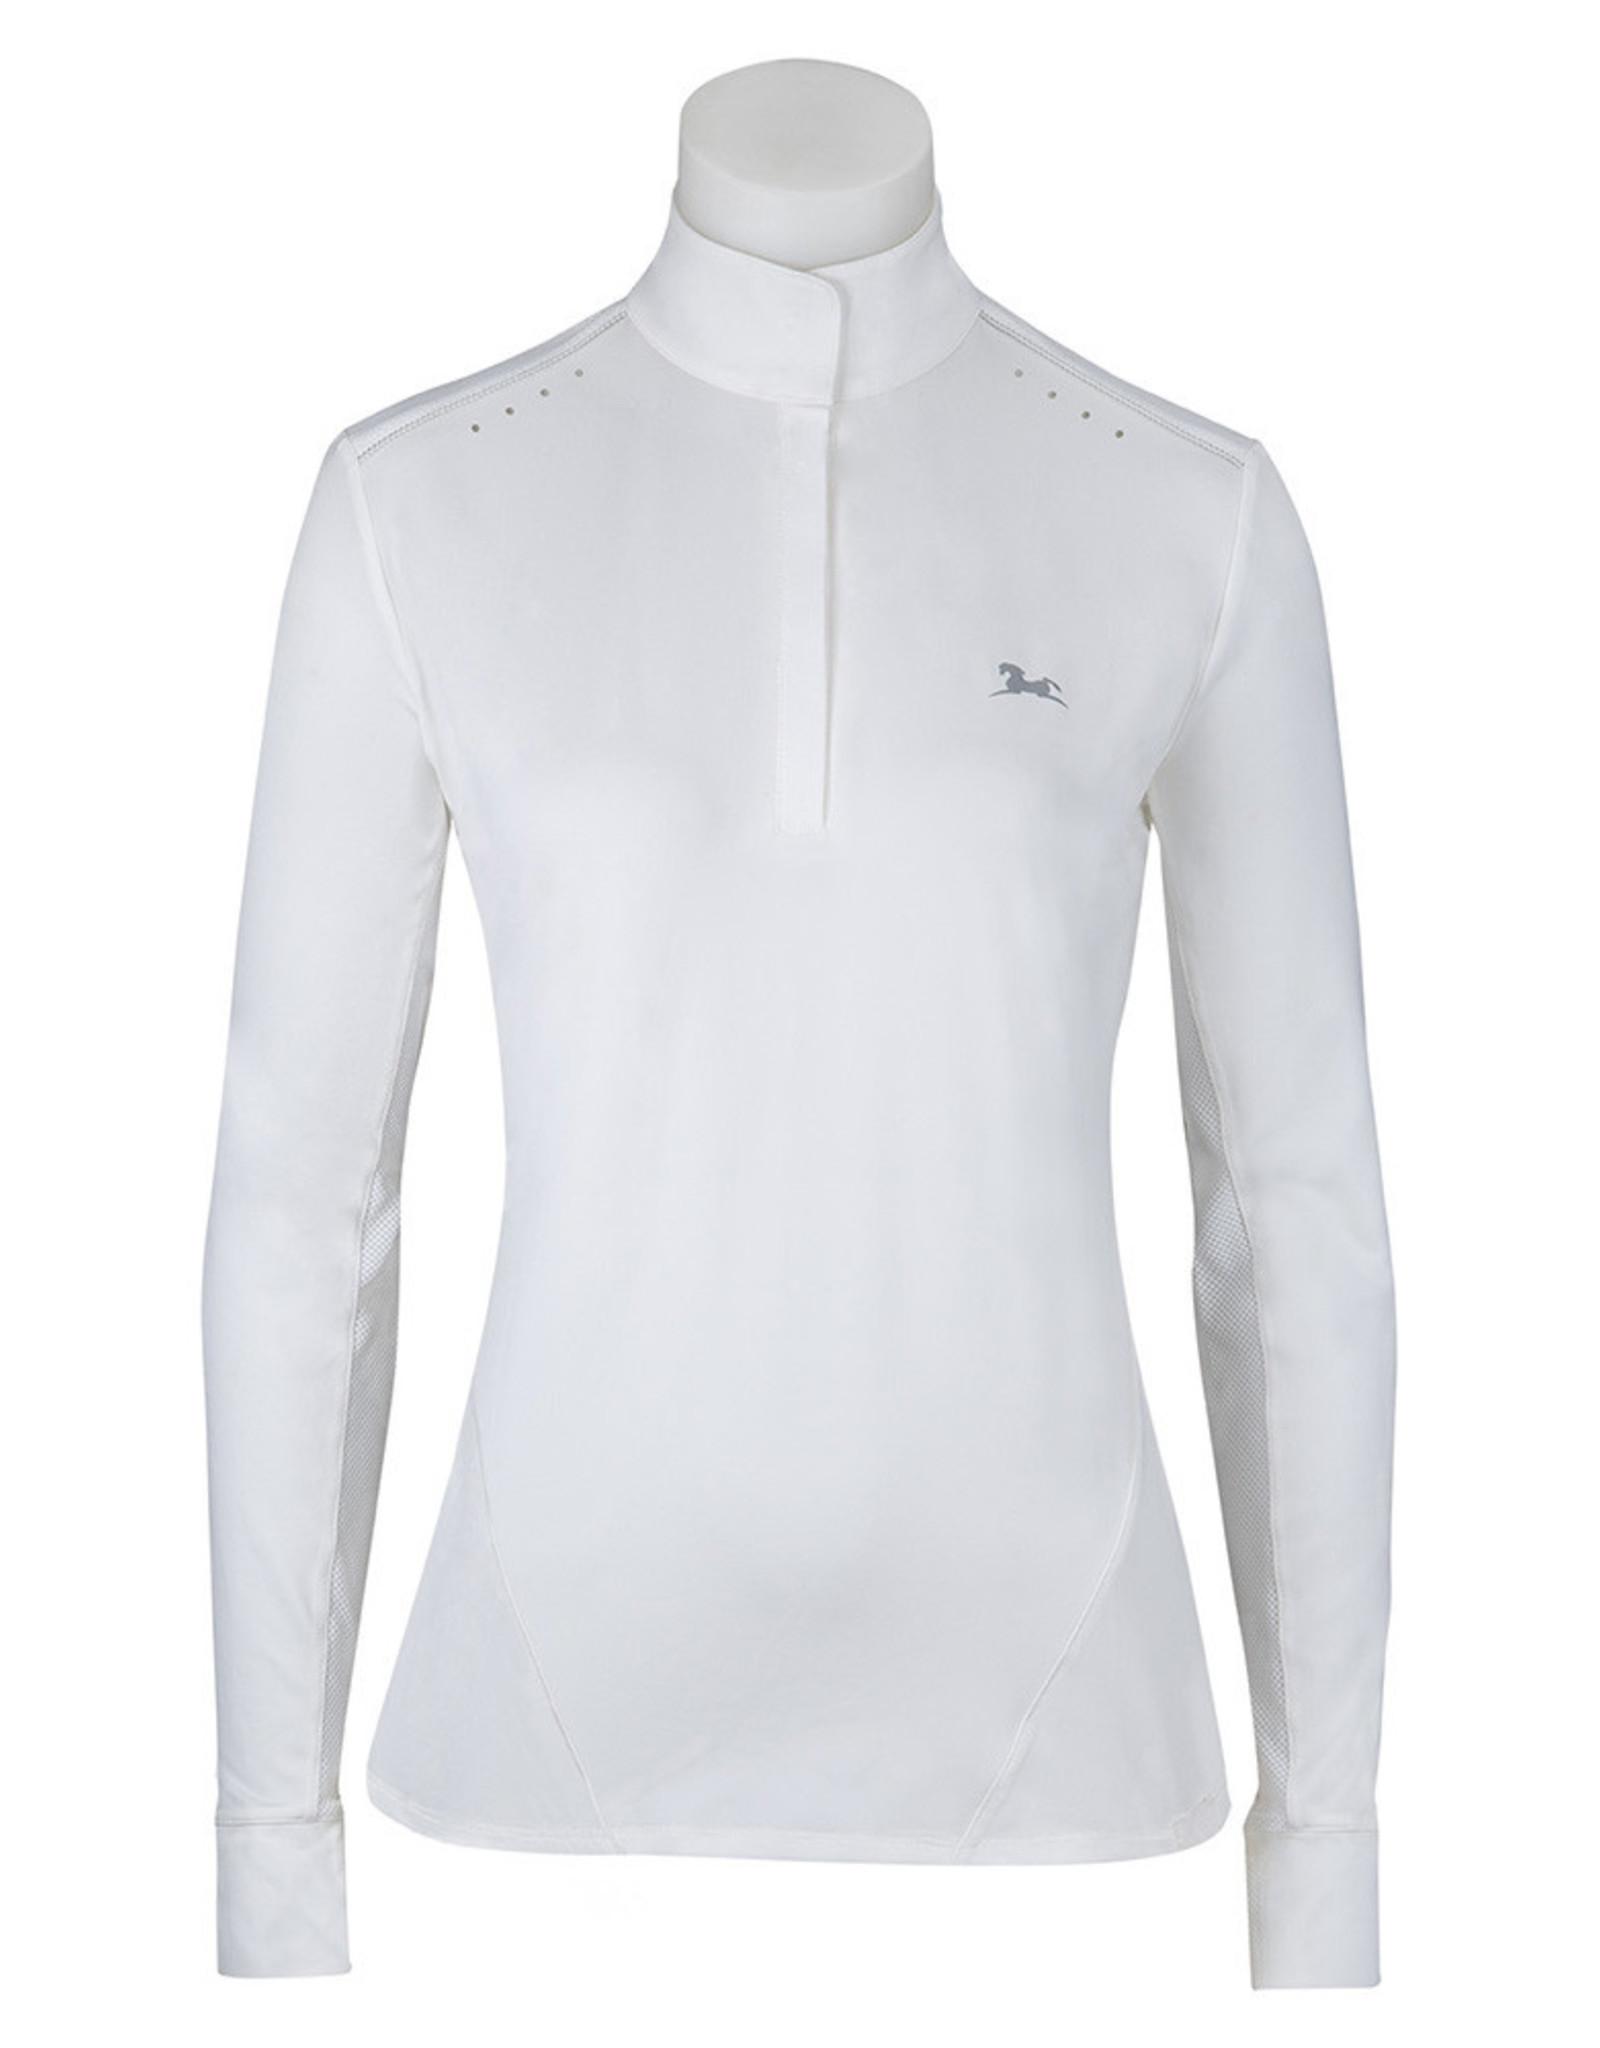 RJ CLASSICS Freestyle Ladies' 37.5® Long Sleeve Show Shirt